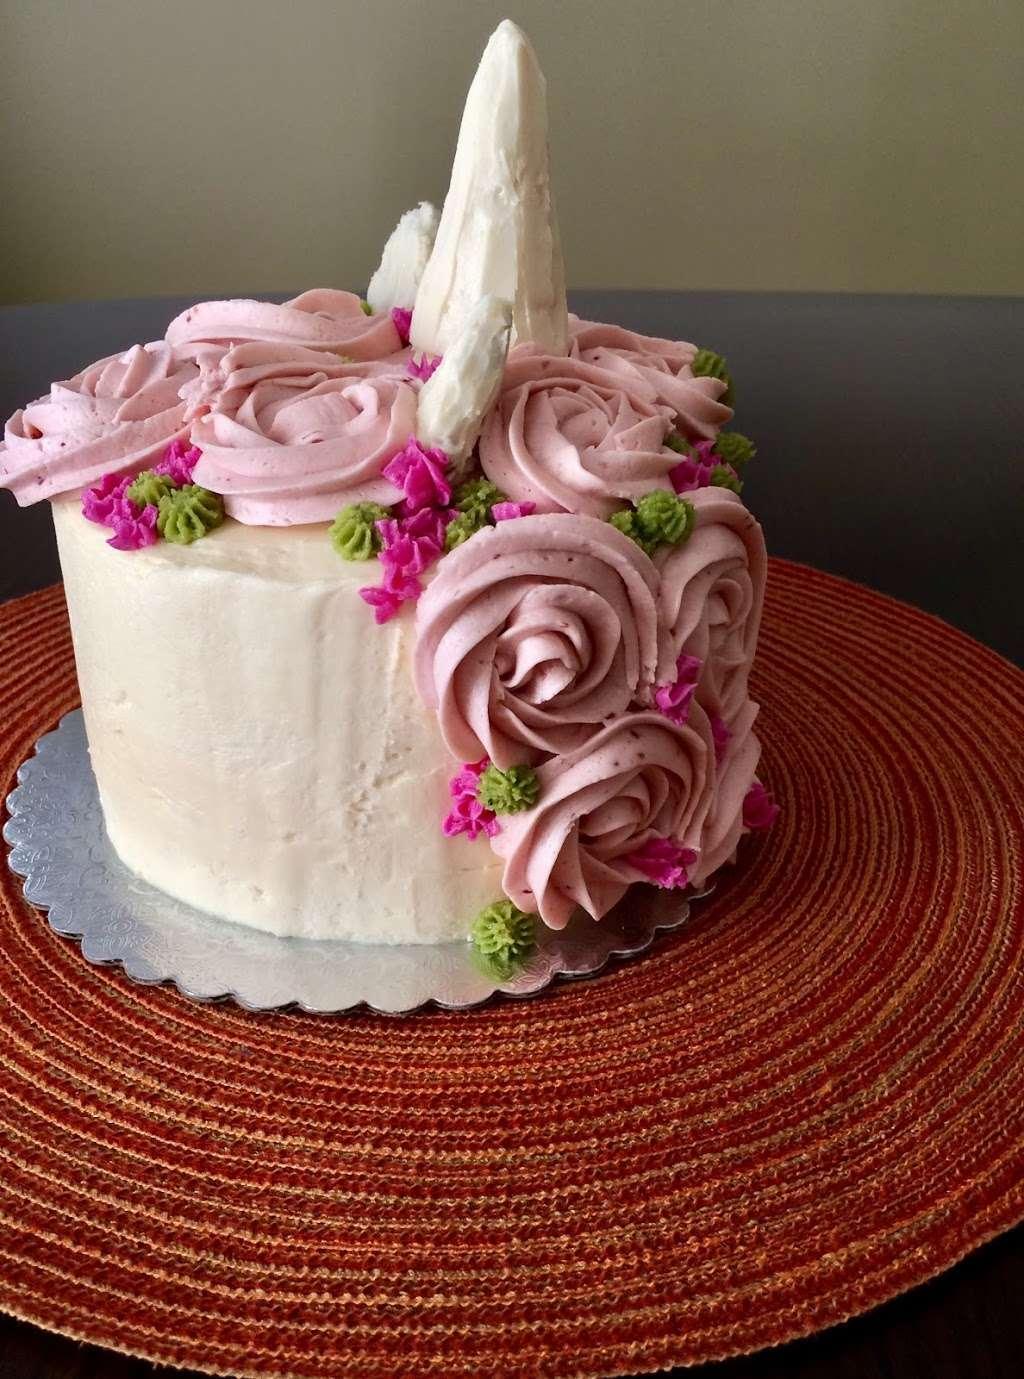 Melt in Your Mouth LLC - bakery  | Photo 3 of 10 | Address: 15 Cypress Ln, Walpole, MA 02081, USA | Phone: (972) 740-3204